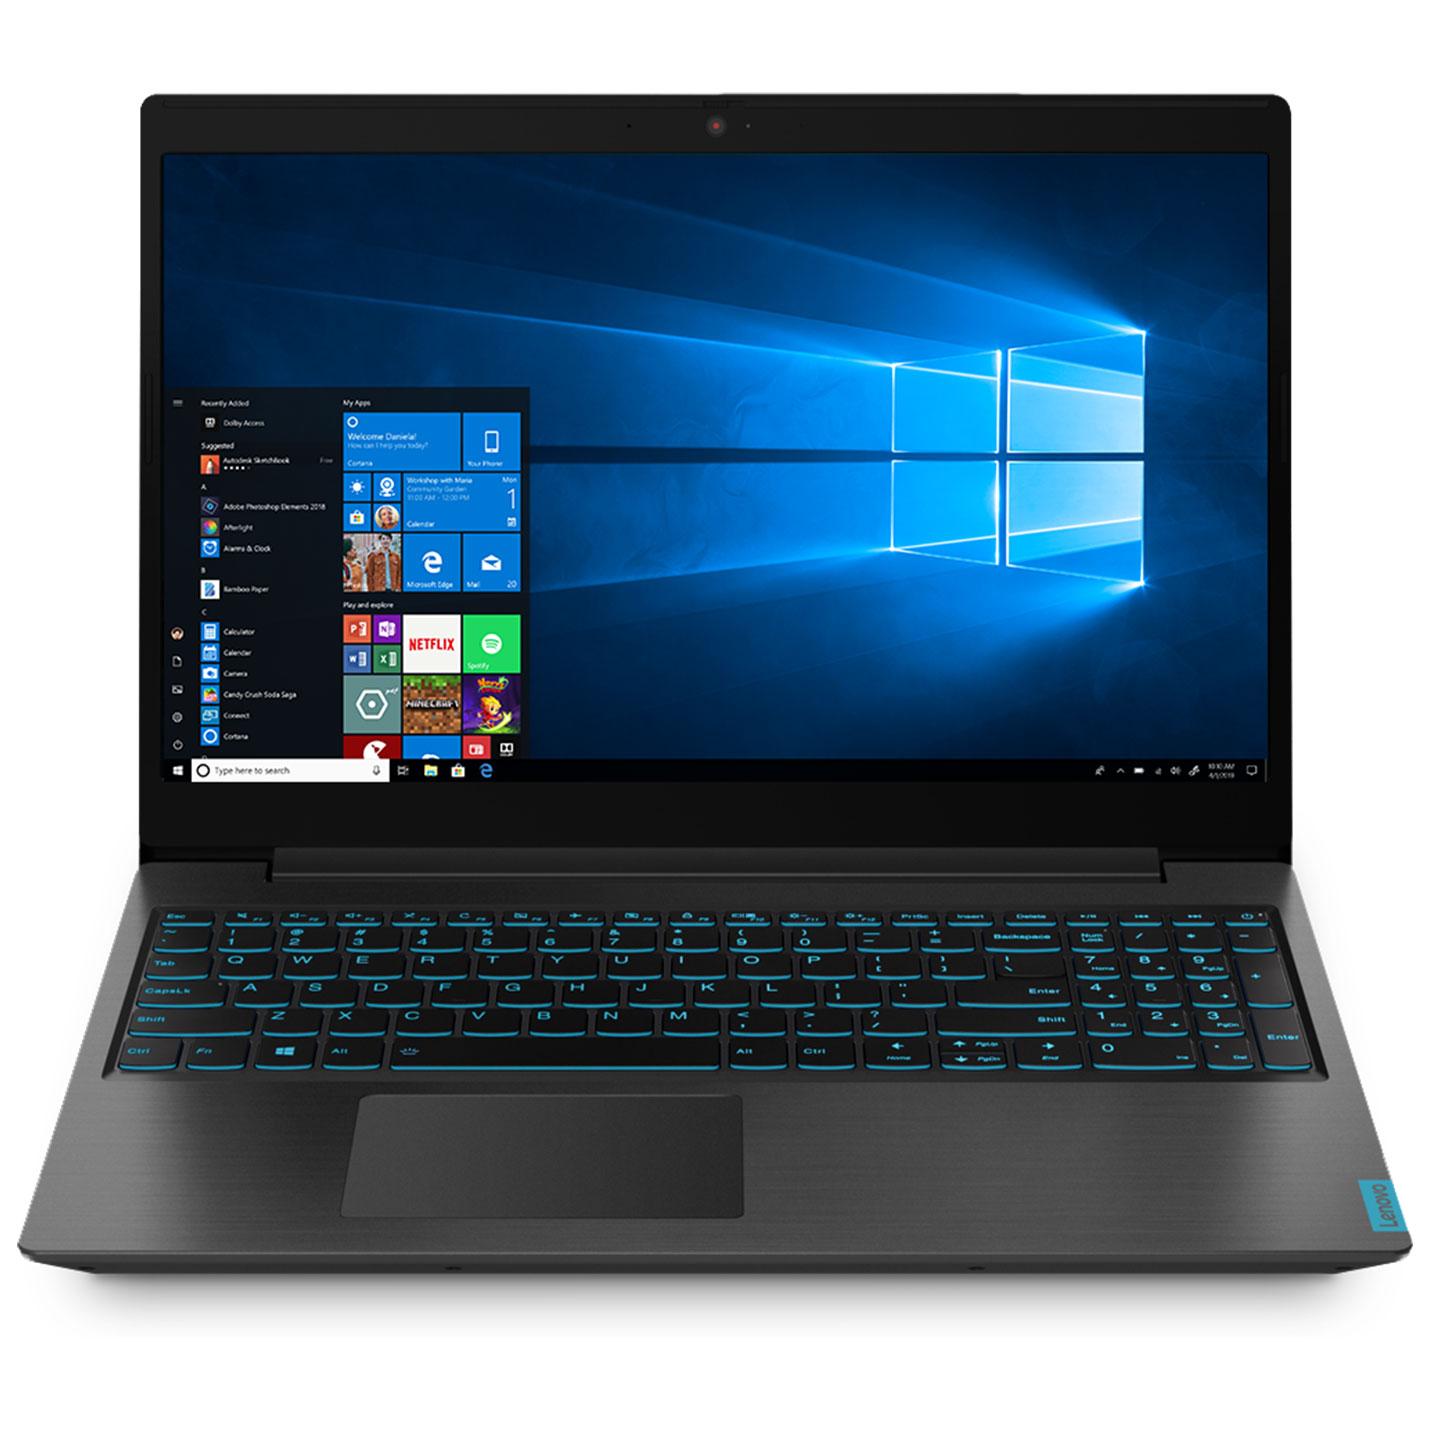 Laptop Cũ Lenovo Ideapad L340-15IRH Core i5 9300HF, Ram 8GB, SSD 256GB, 15.6 Inch Full IPS, GTX 1050